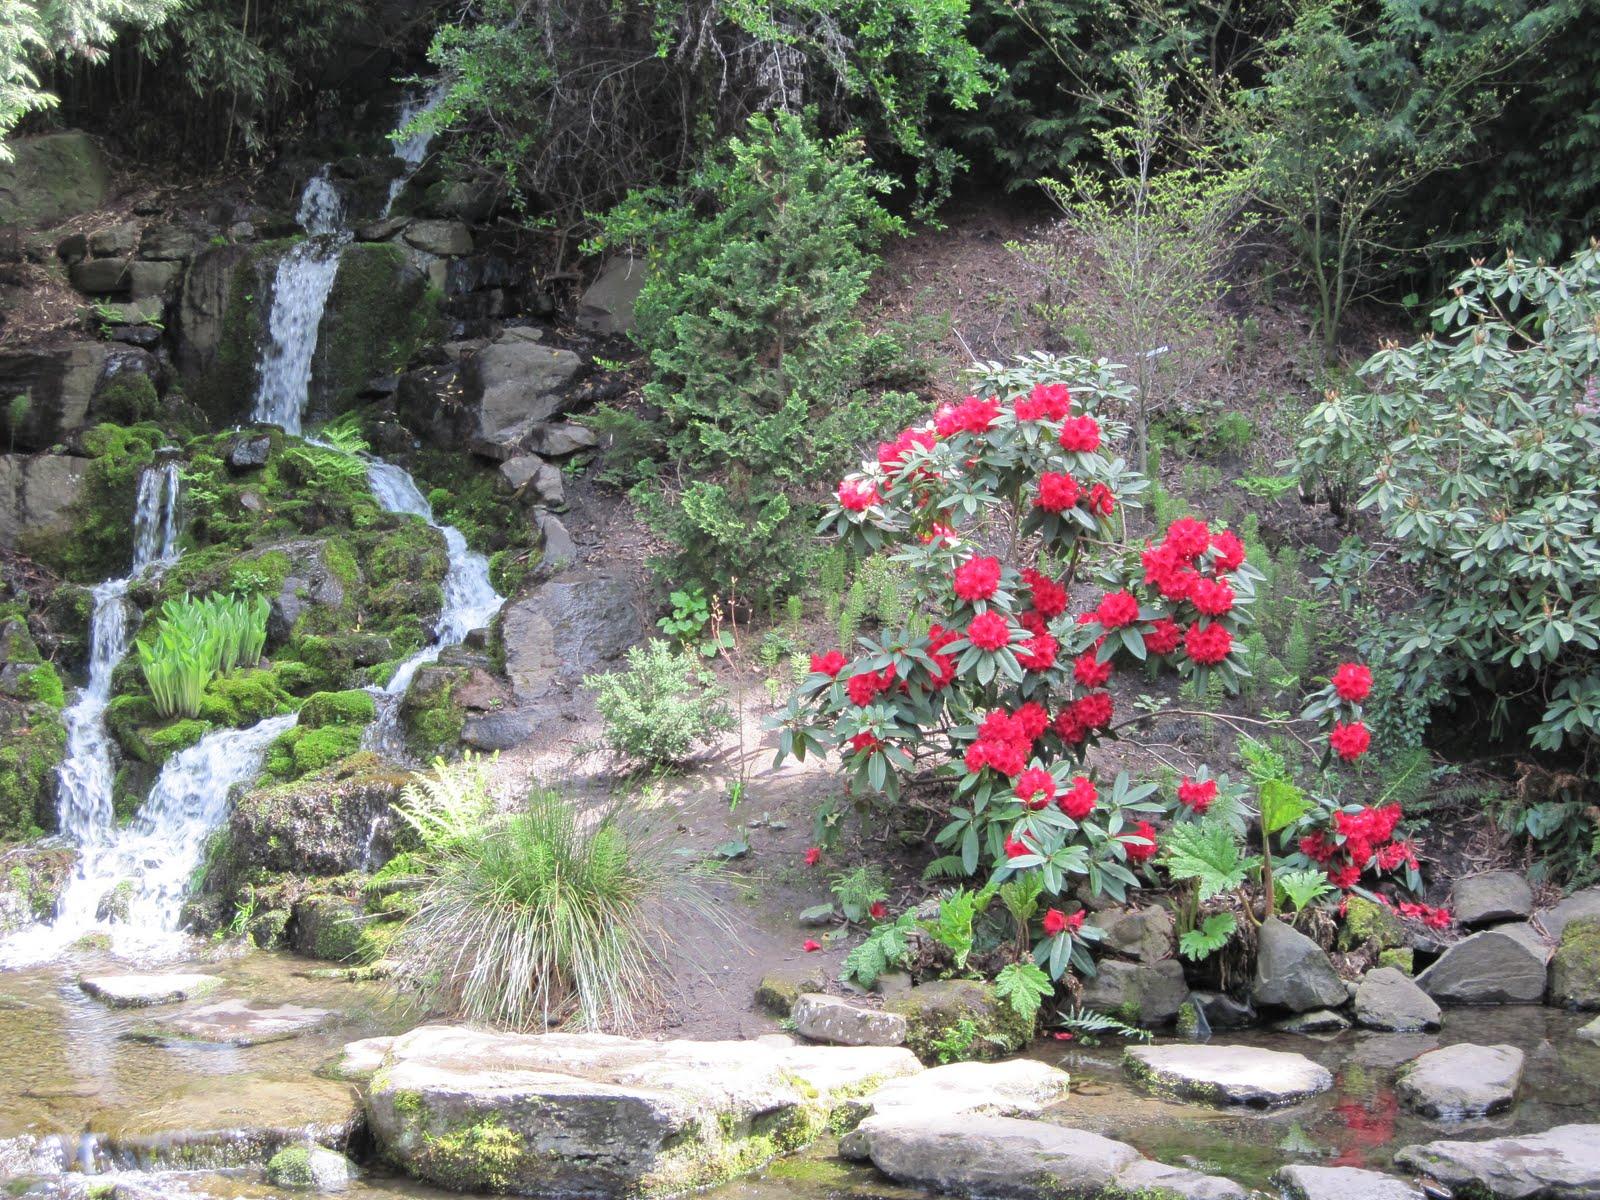 The Schramm Journey Crystal Springs Rhododendron Gardens